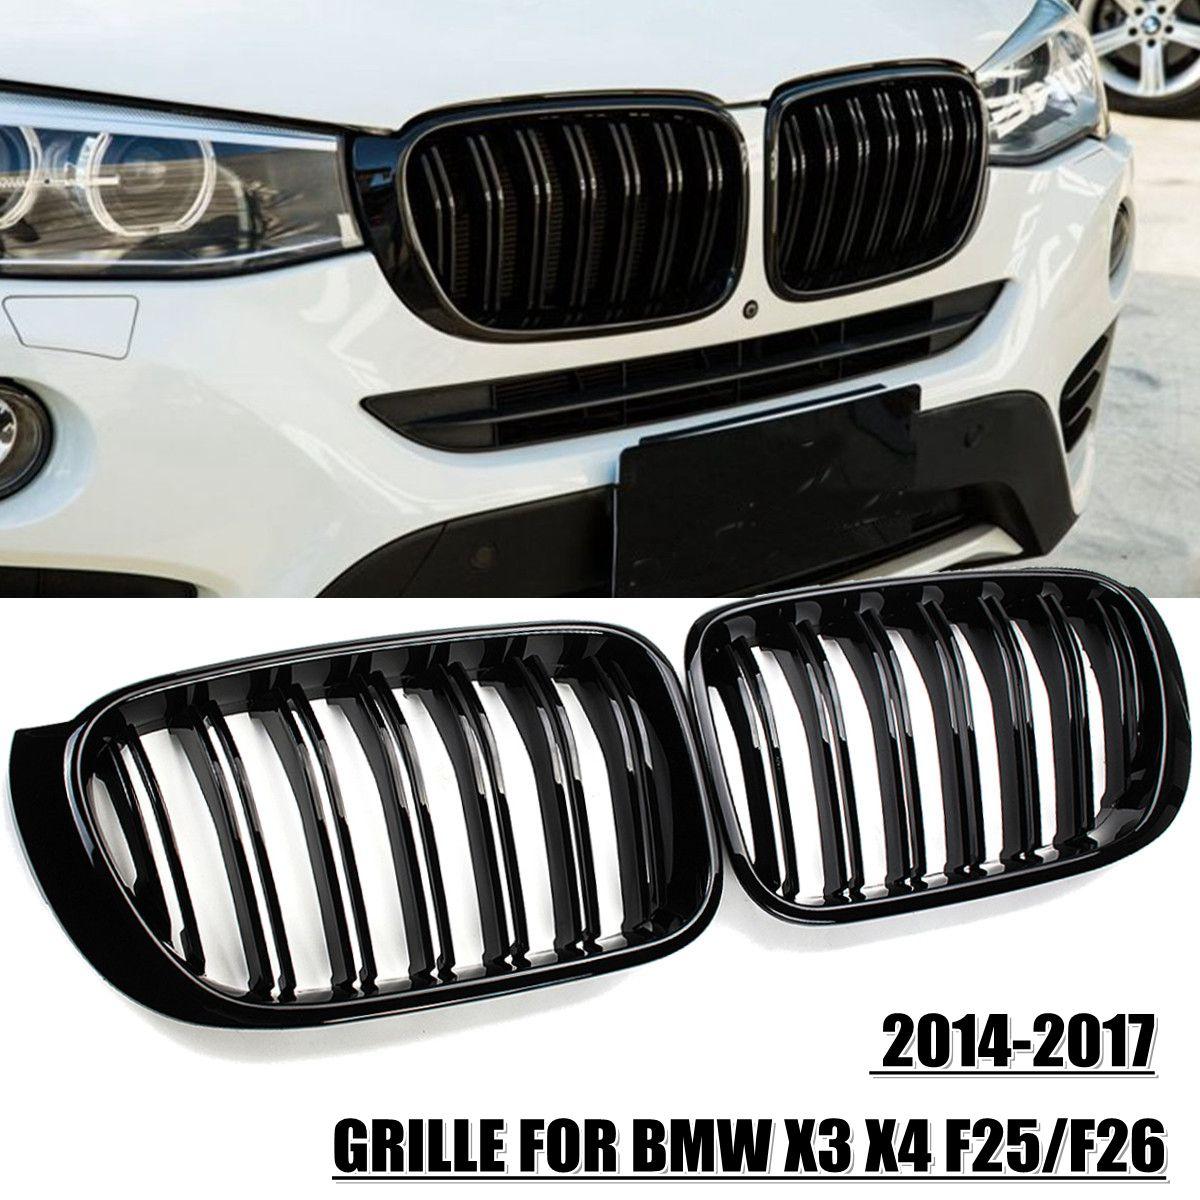 2X M Tarzı Araba Ön Izgara Izgara Mesh Net Trim Şerit Kapağı Parlak Siyah Için BMW X3 X4 F25 F26 2014 2015 2016 2017